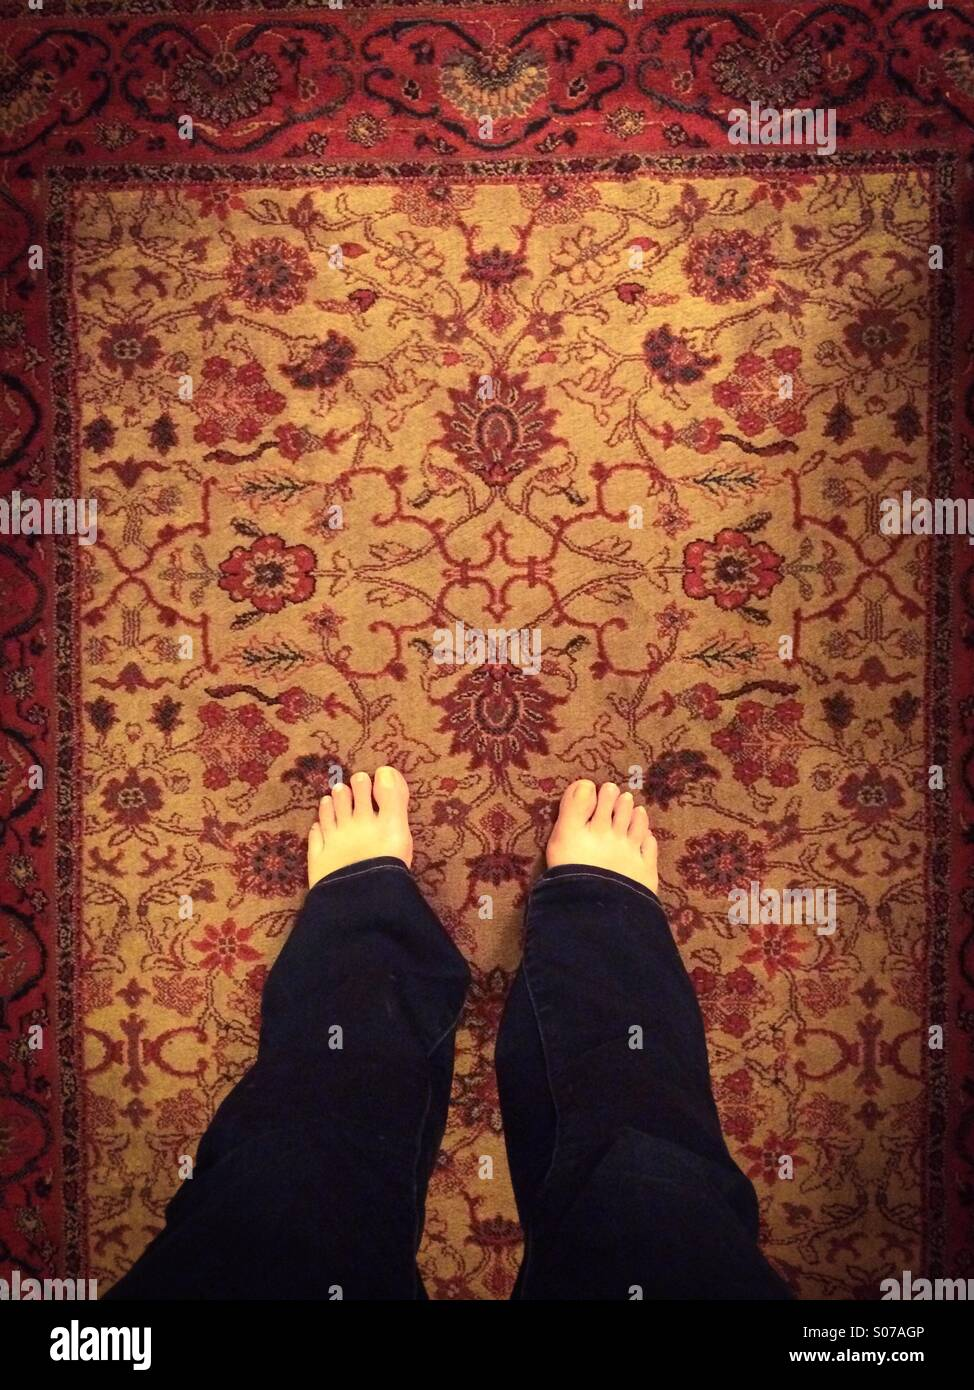 Bare feet on rug - Stock Image